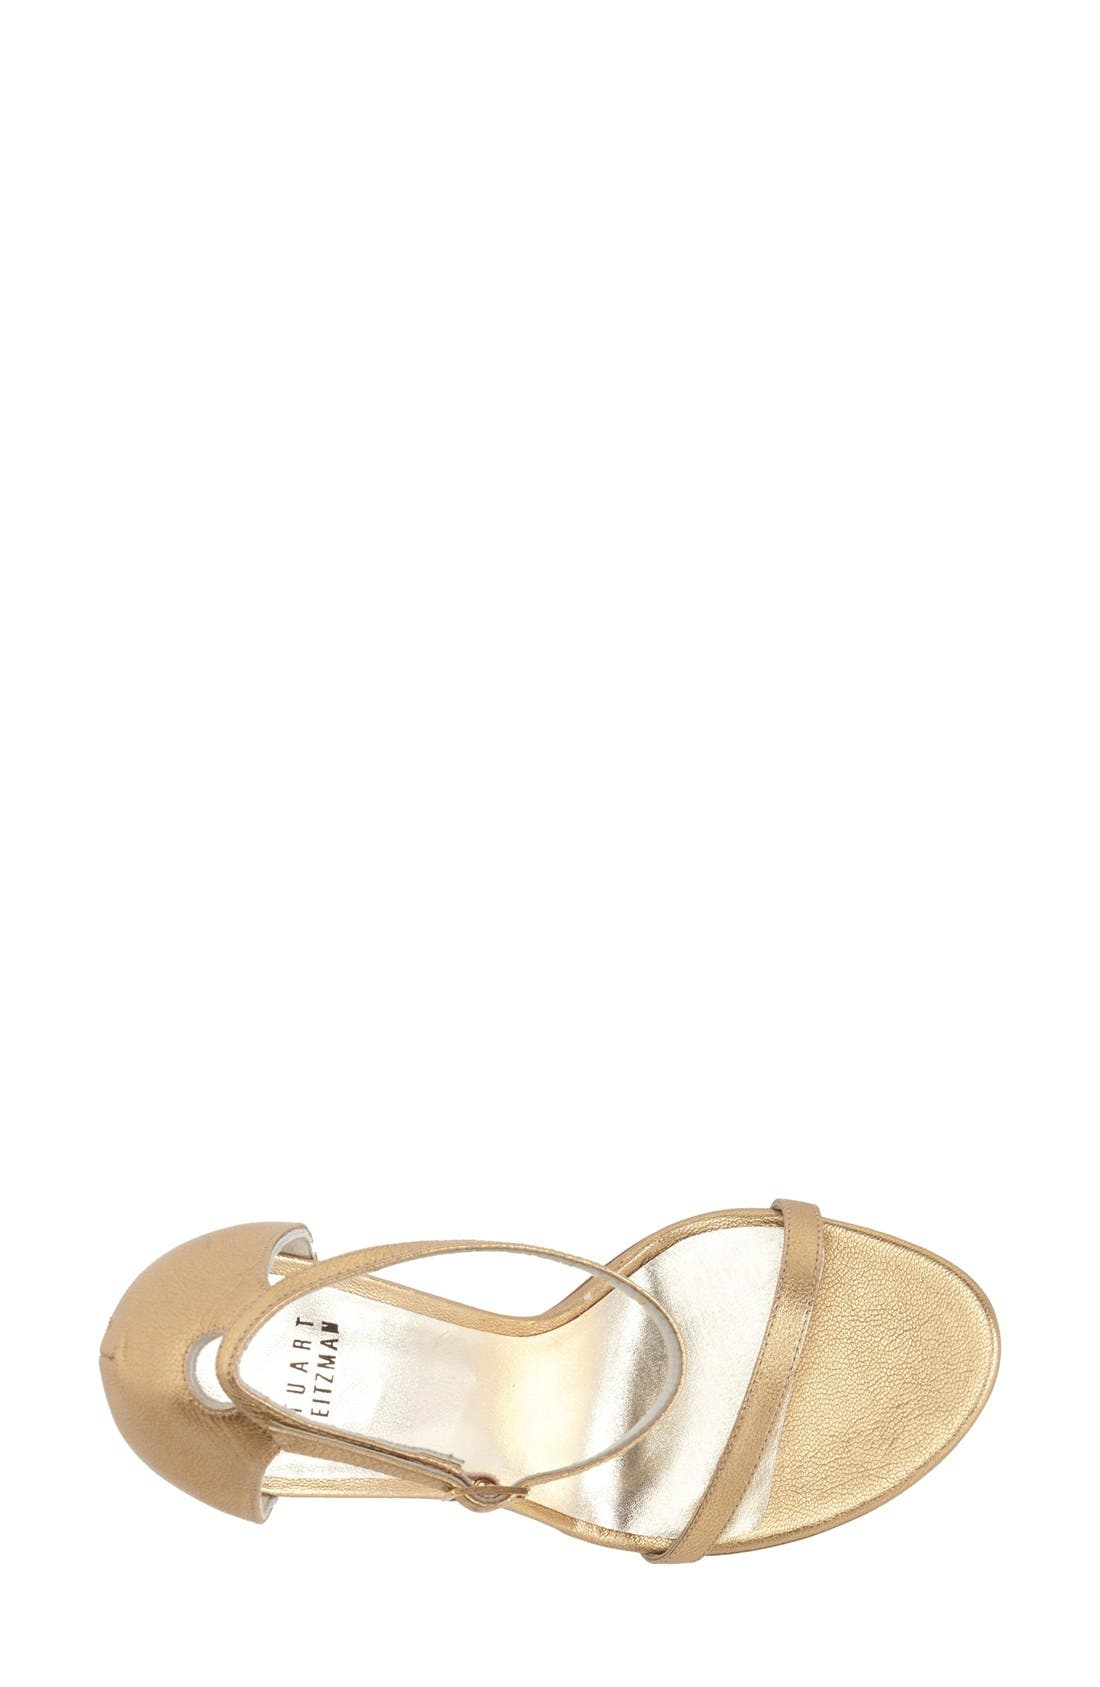 Nudistsong Ankle Strap Sandal,                             Alternate thumbnail 127, color,